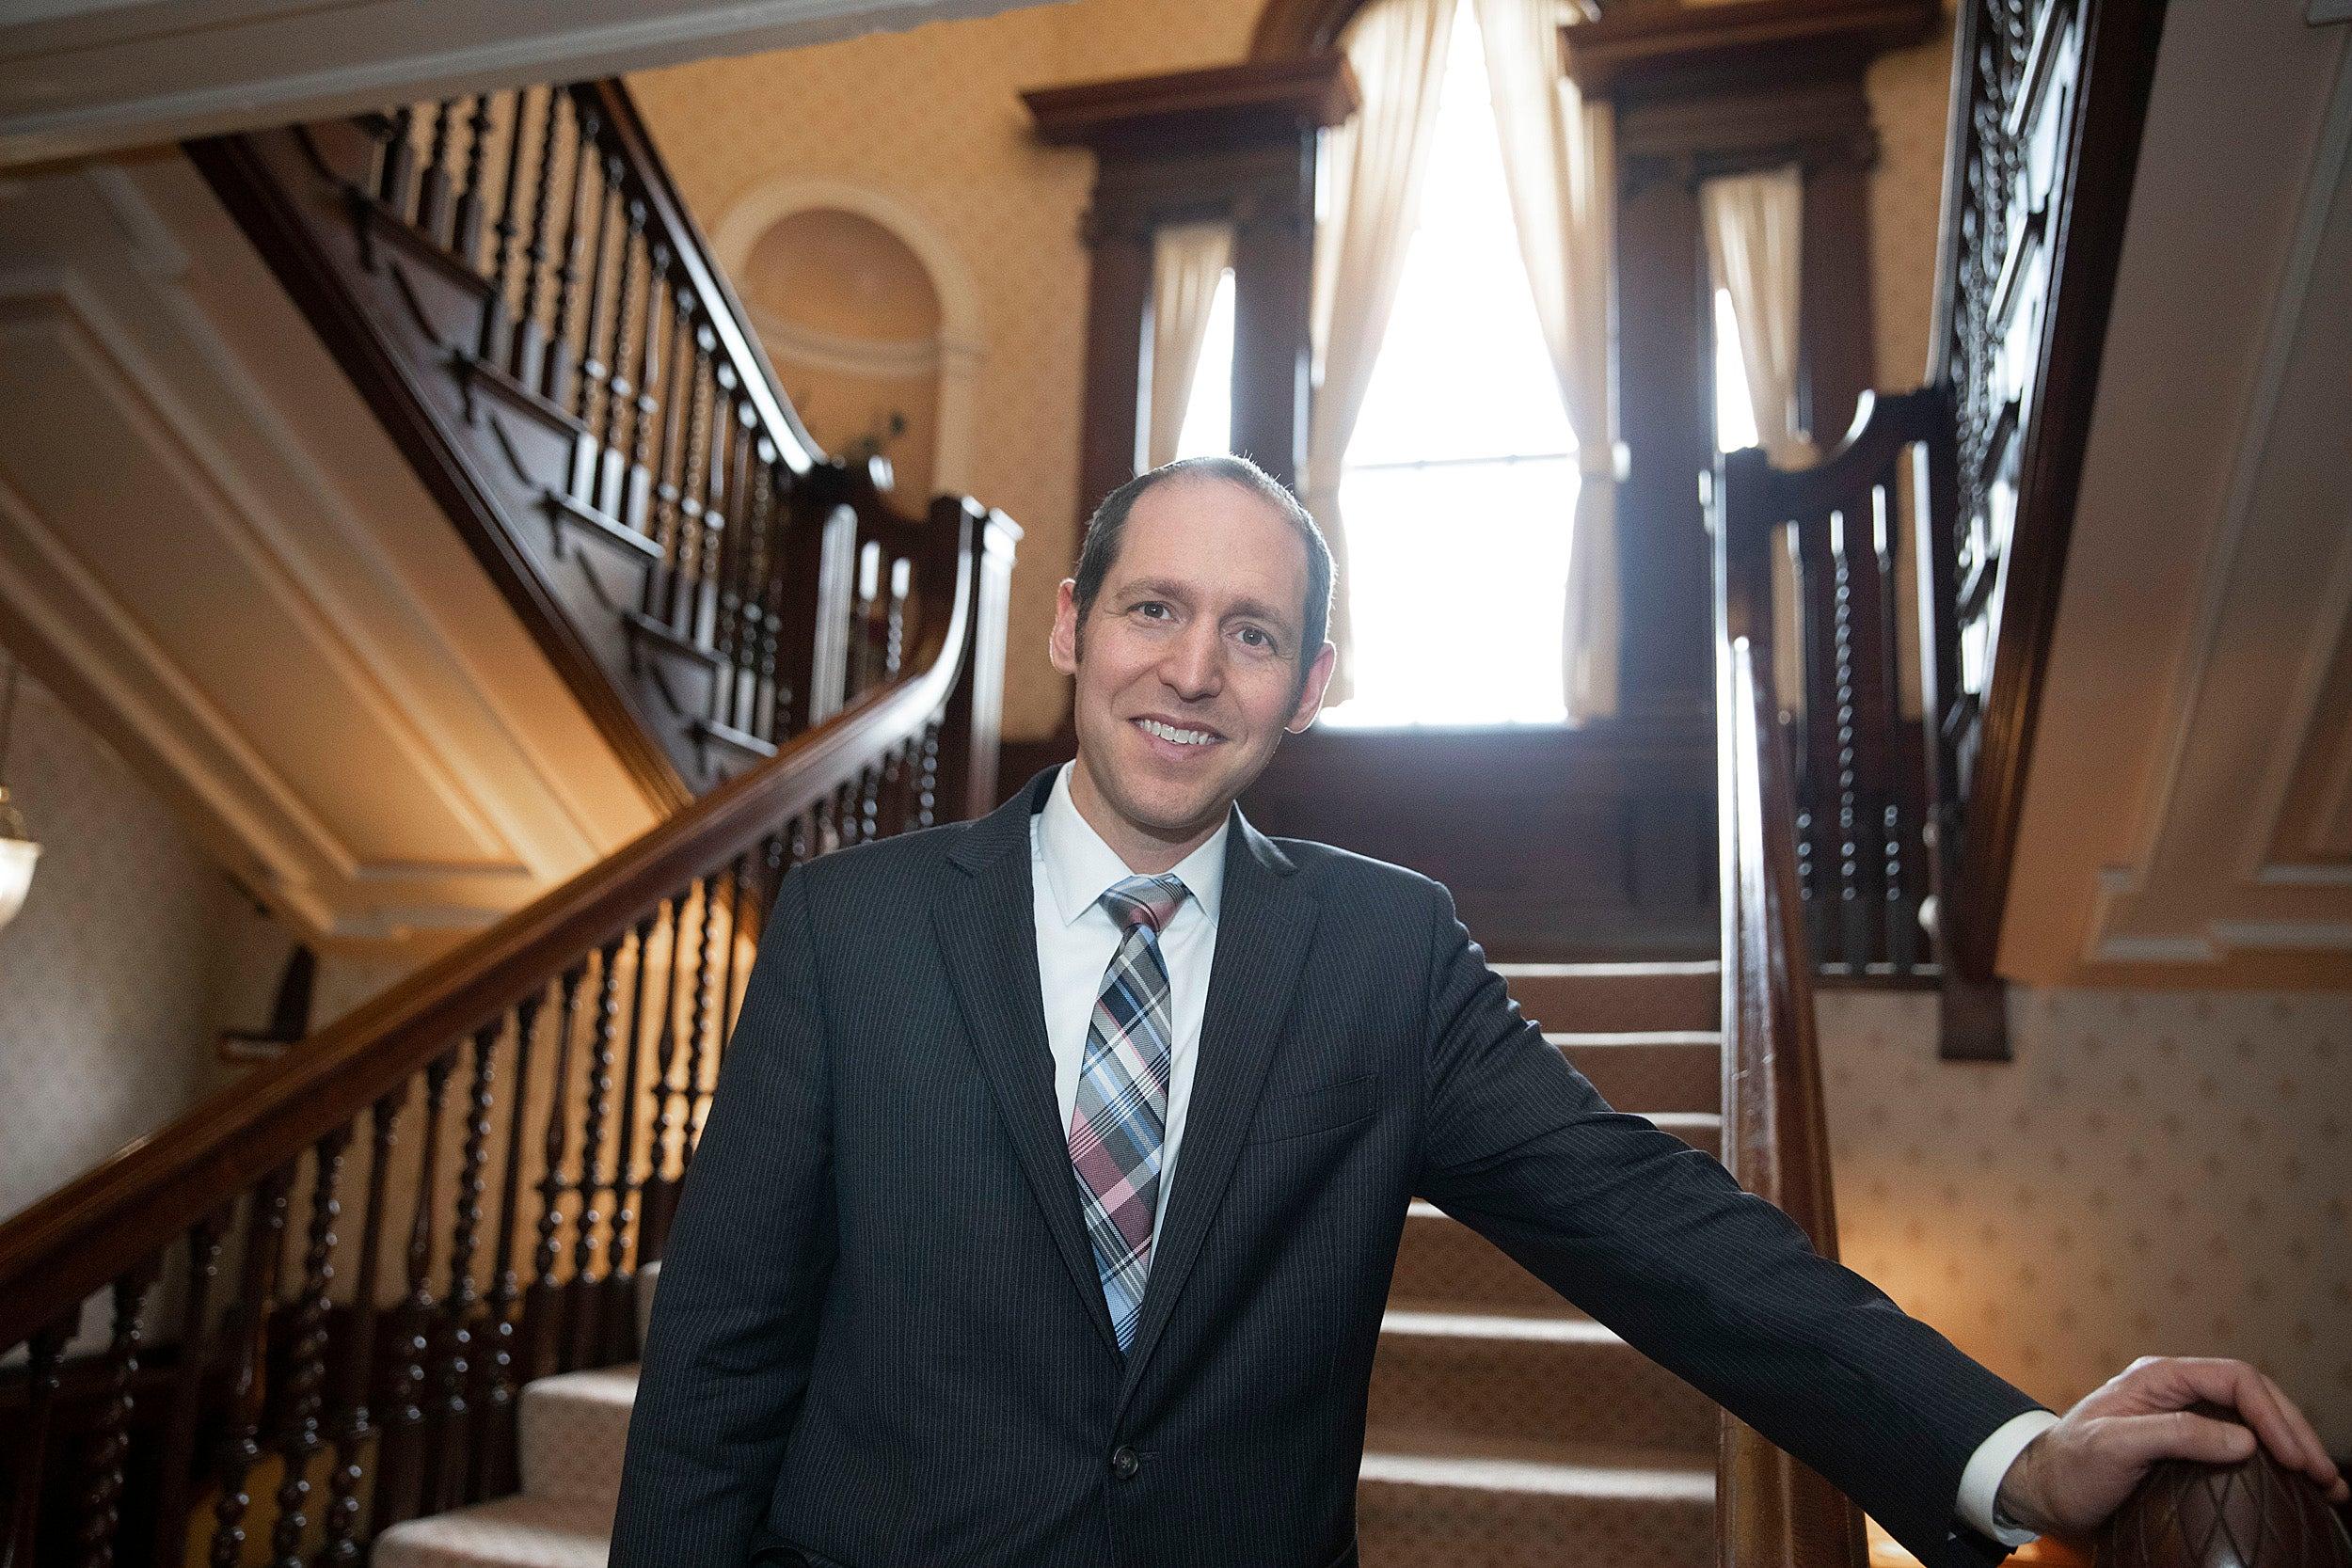 David Rosmarin on a staircase